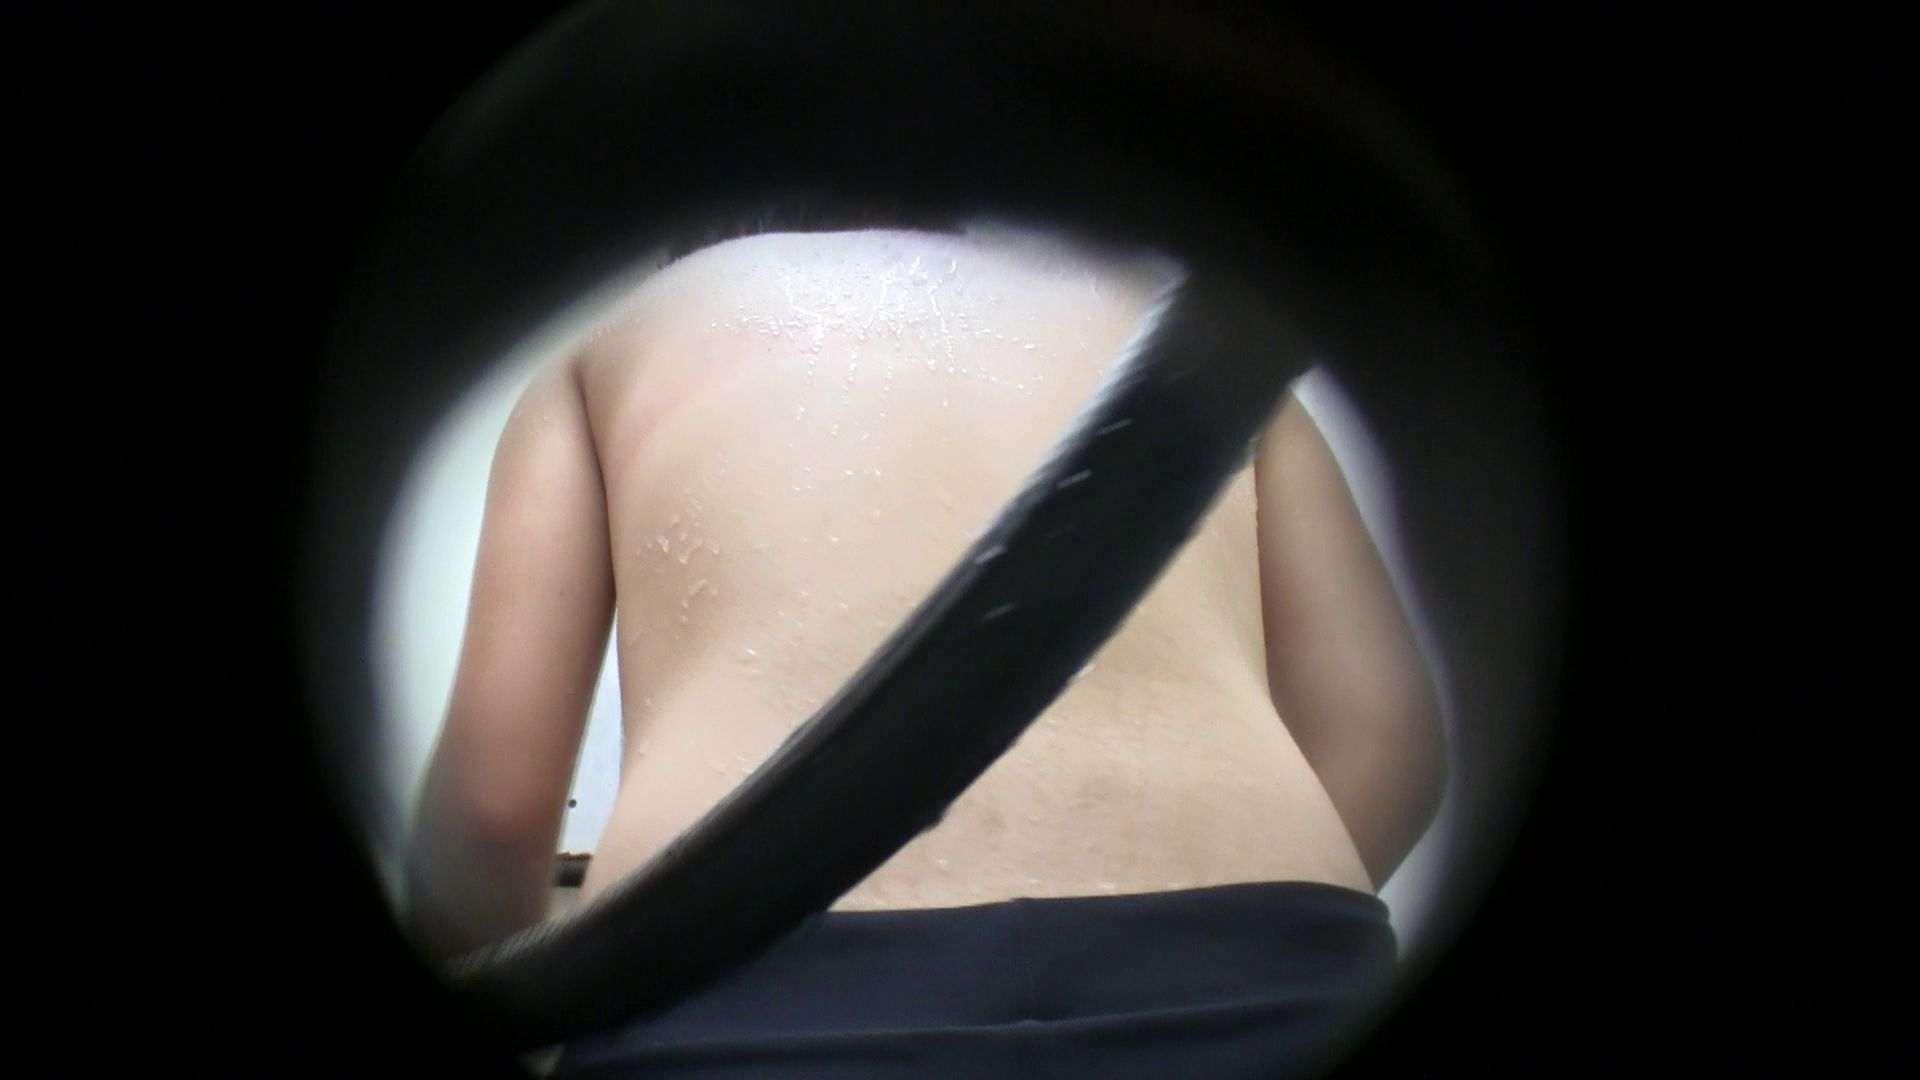 NO.43 乳首の先がチラ 背中でイメージして下さい いろんな乳首 セックス画像 83枚 40